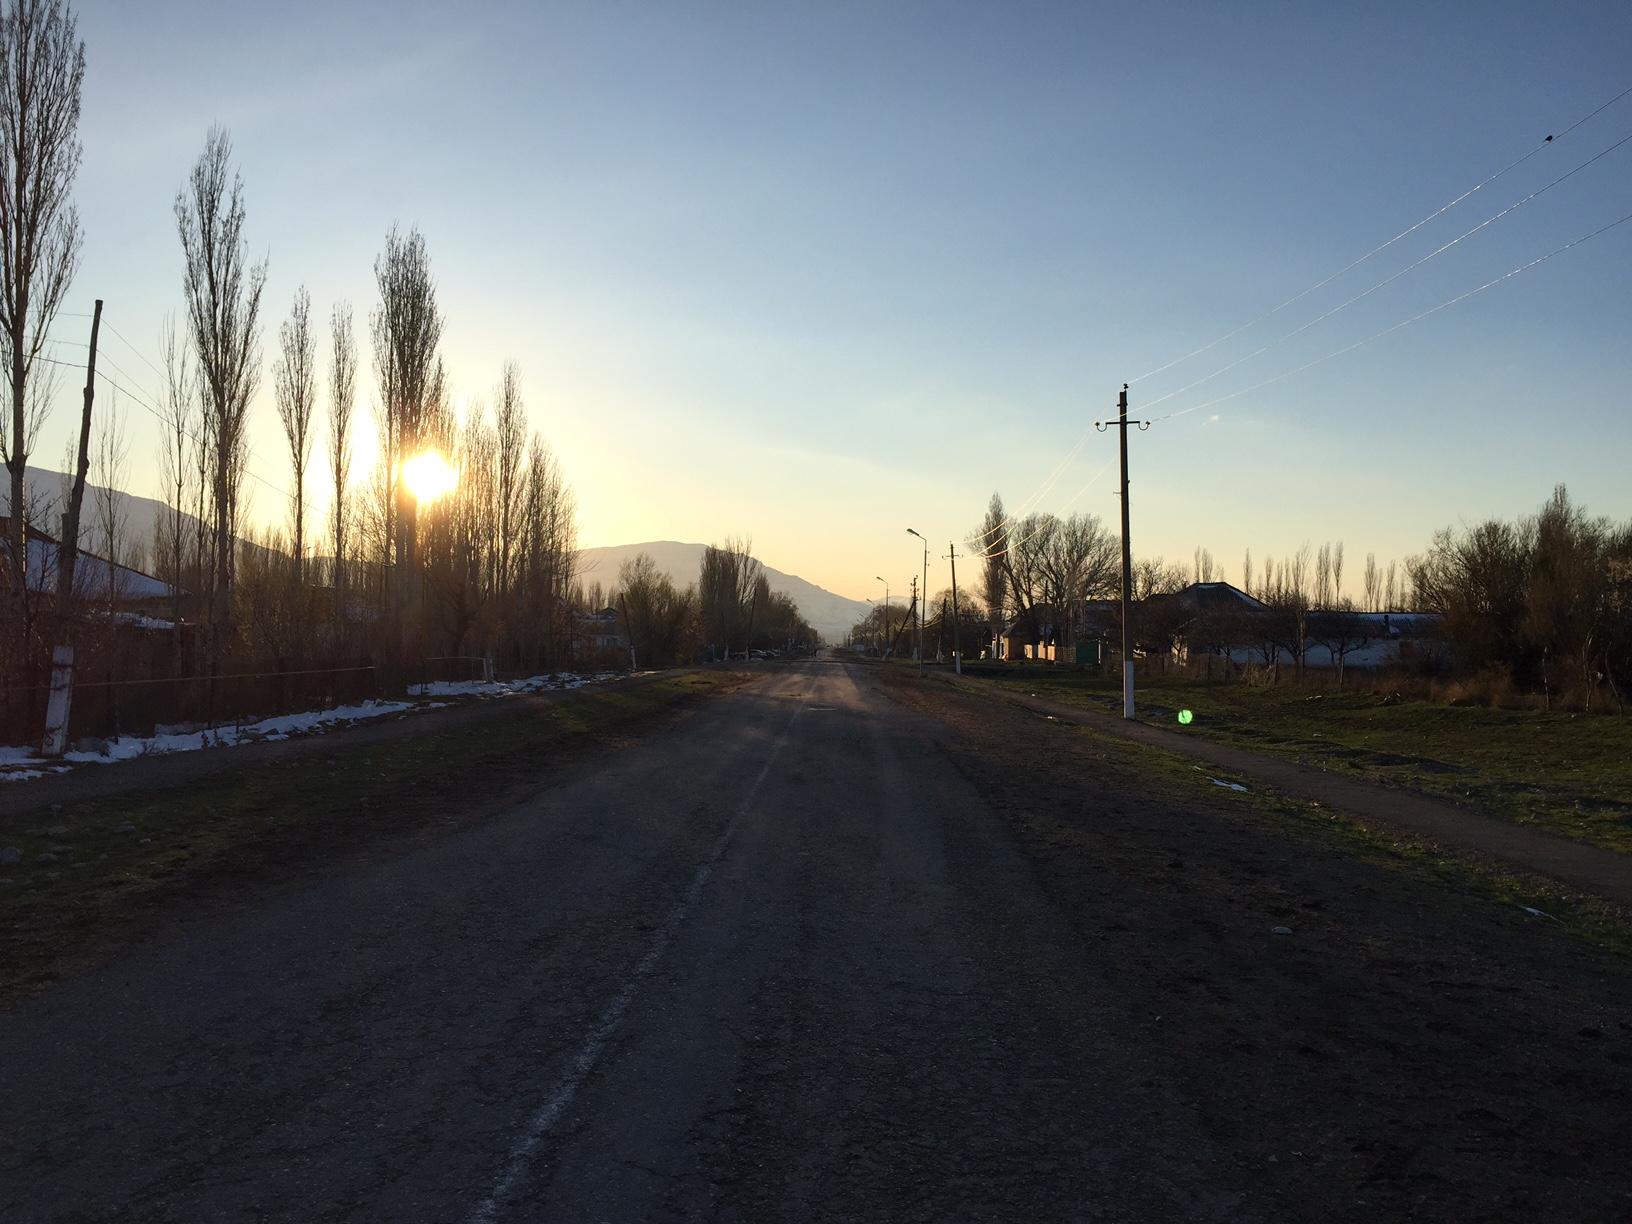 Zhabagly village